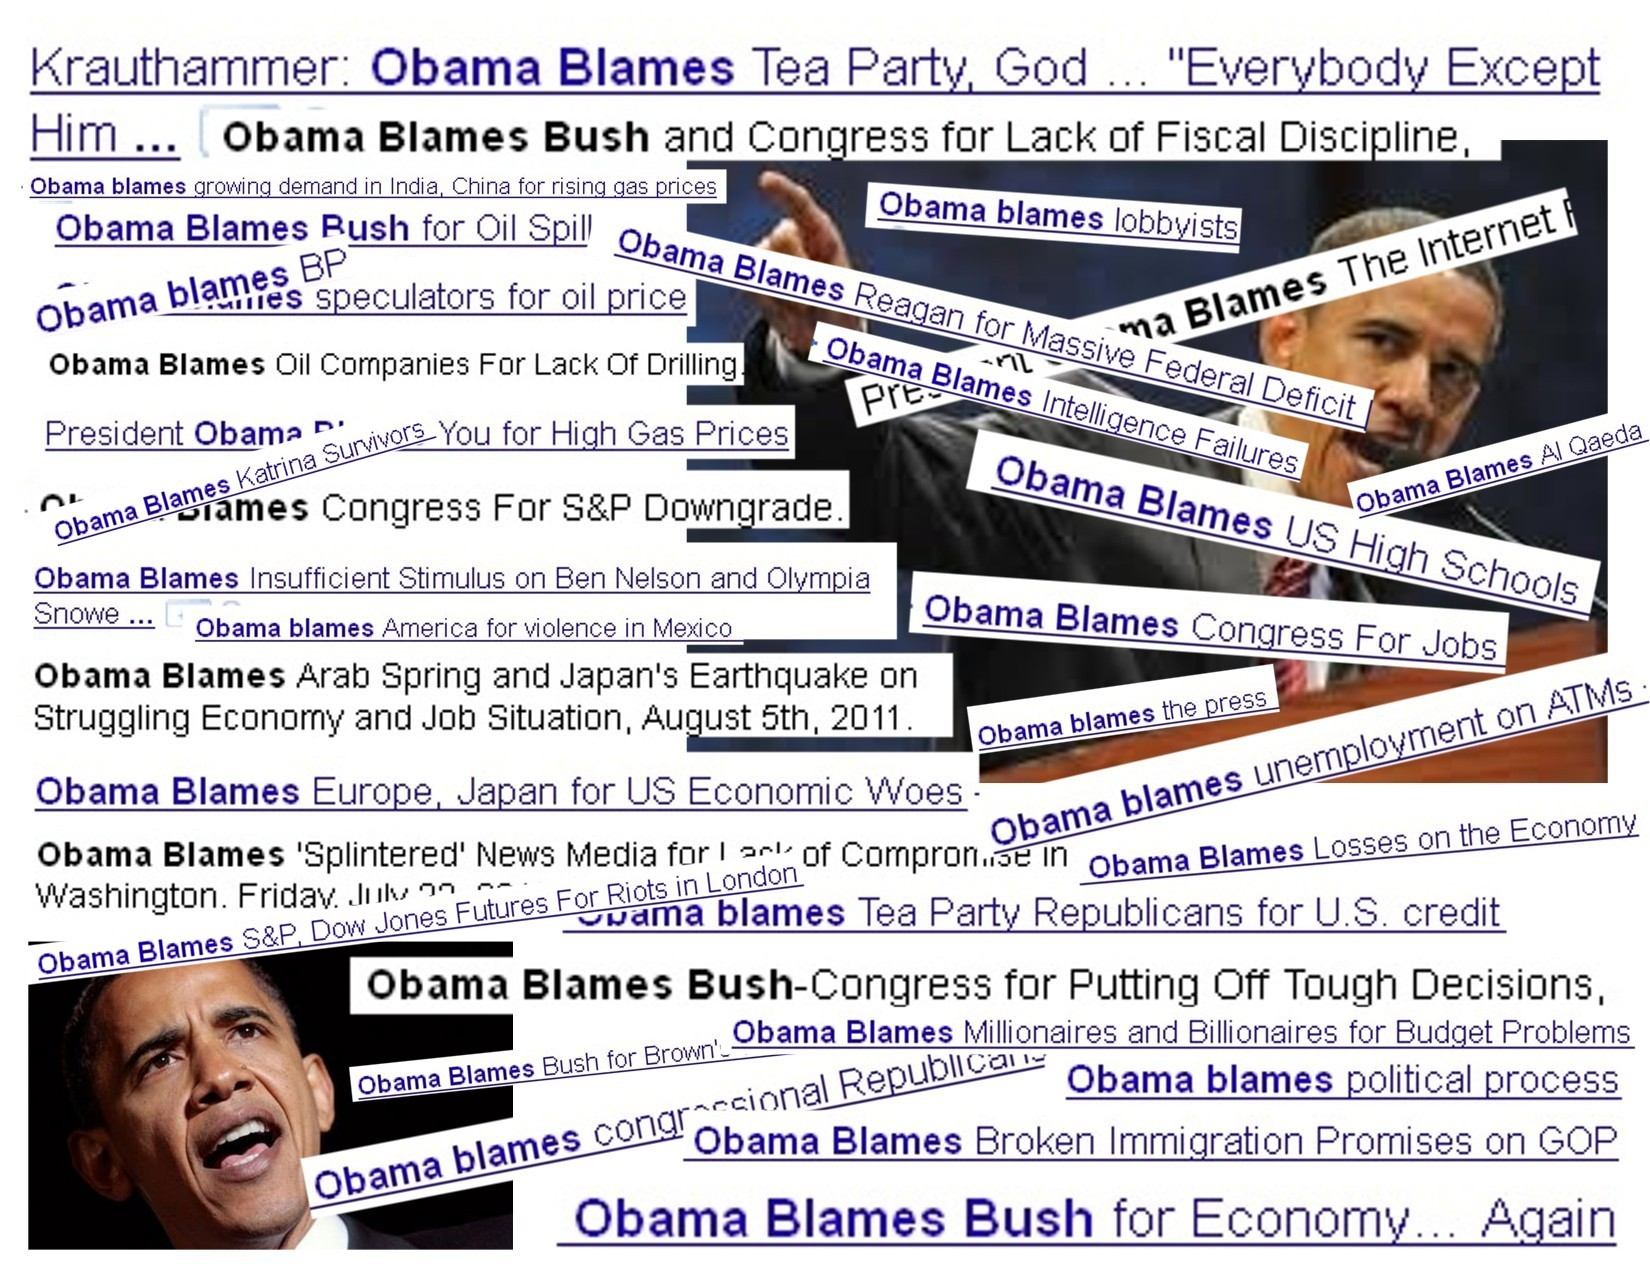 http://polination.files.wordpress.com/2011/08/obama-blames-everyone-but-himself.jpg